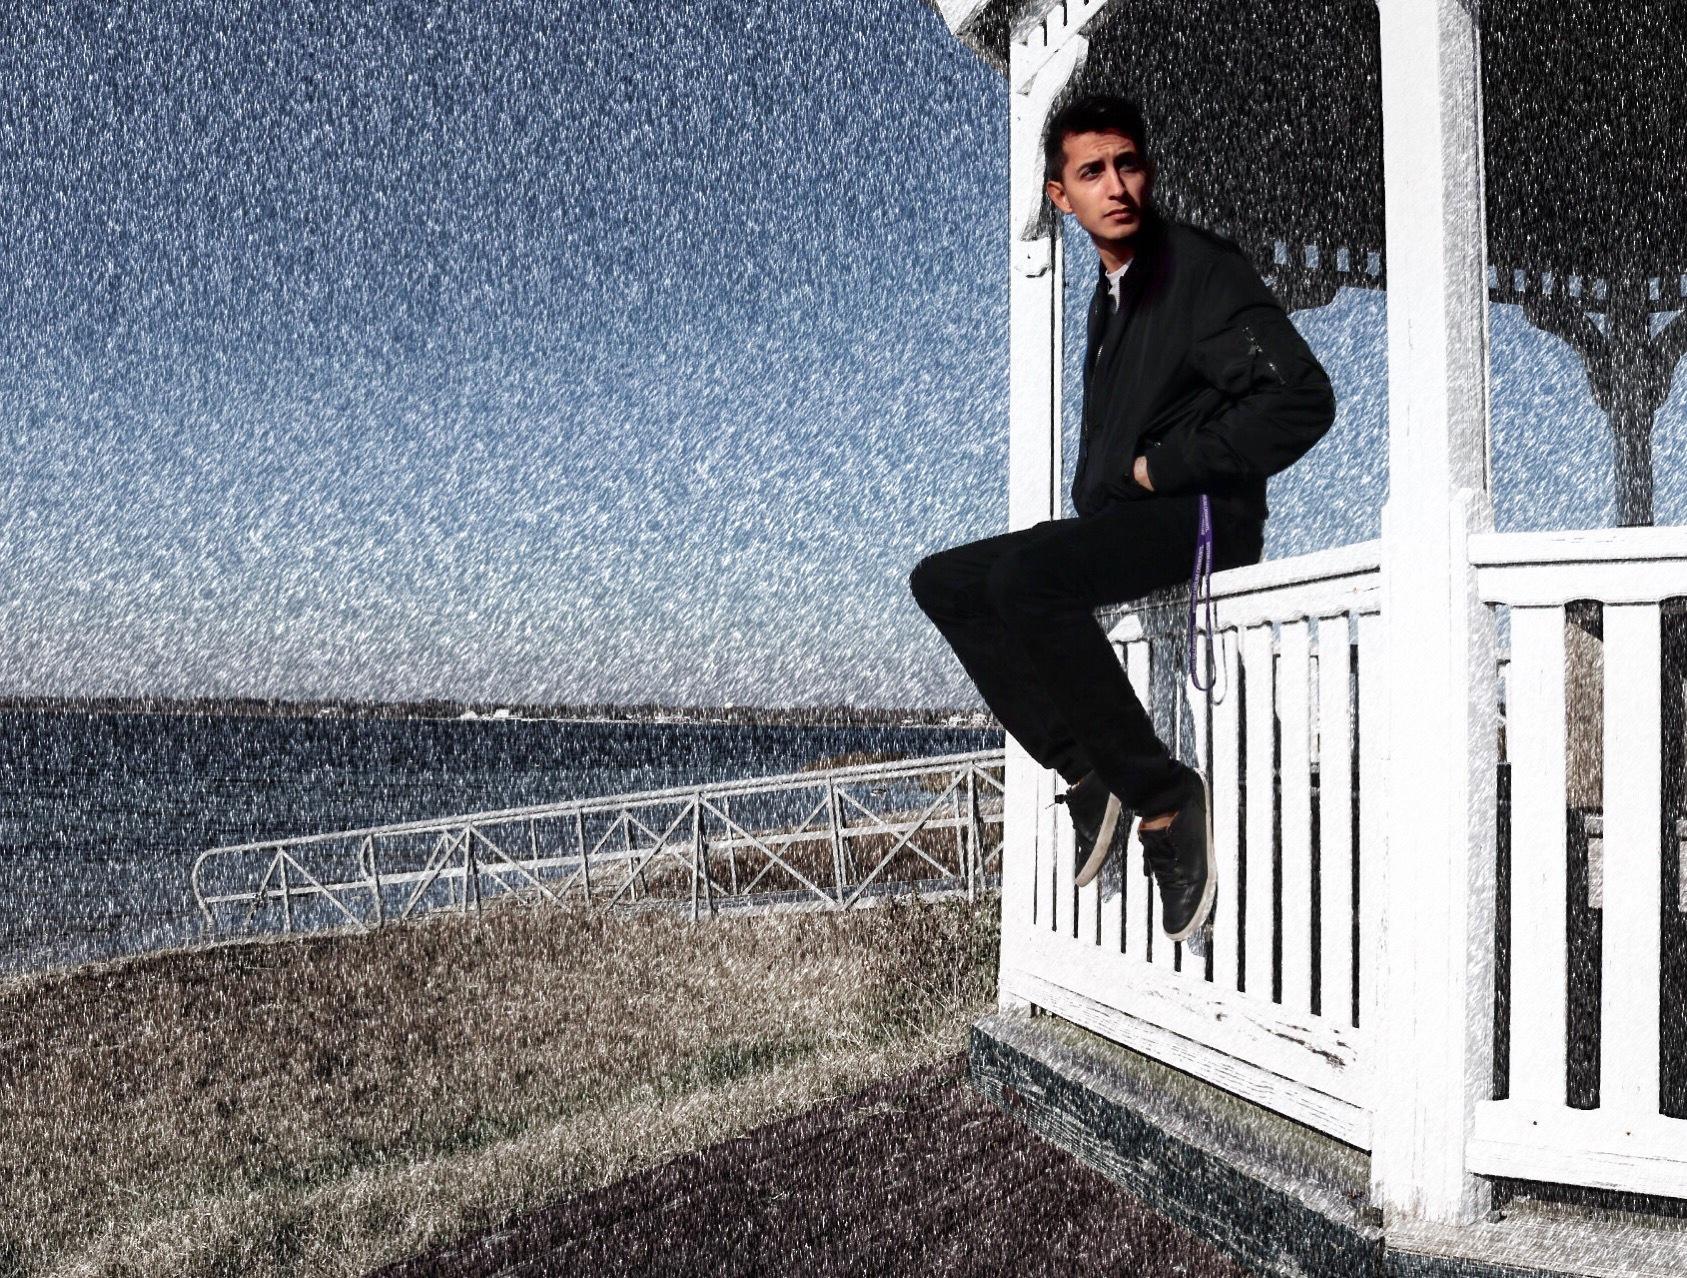 Enjoying the nice breeze  by Francisco Landino